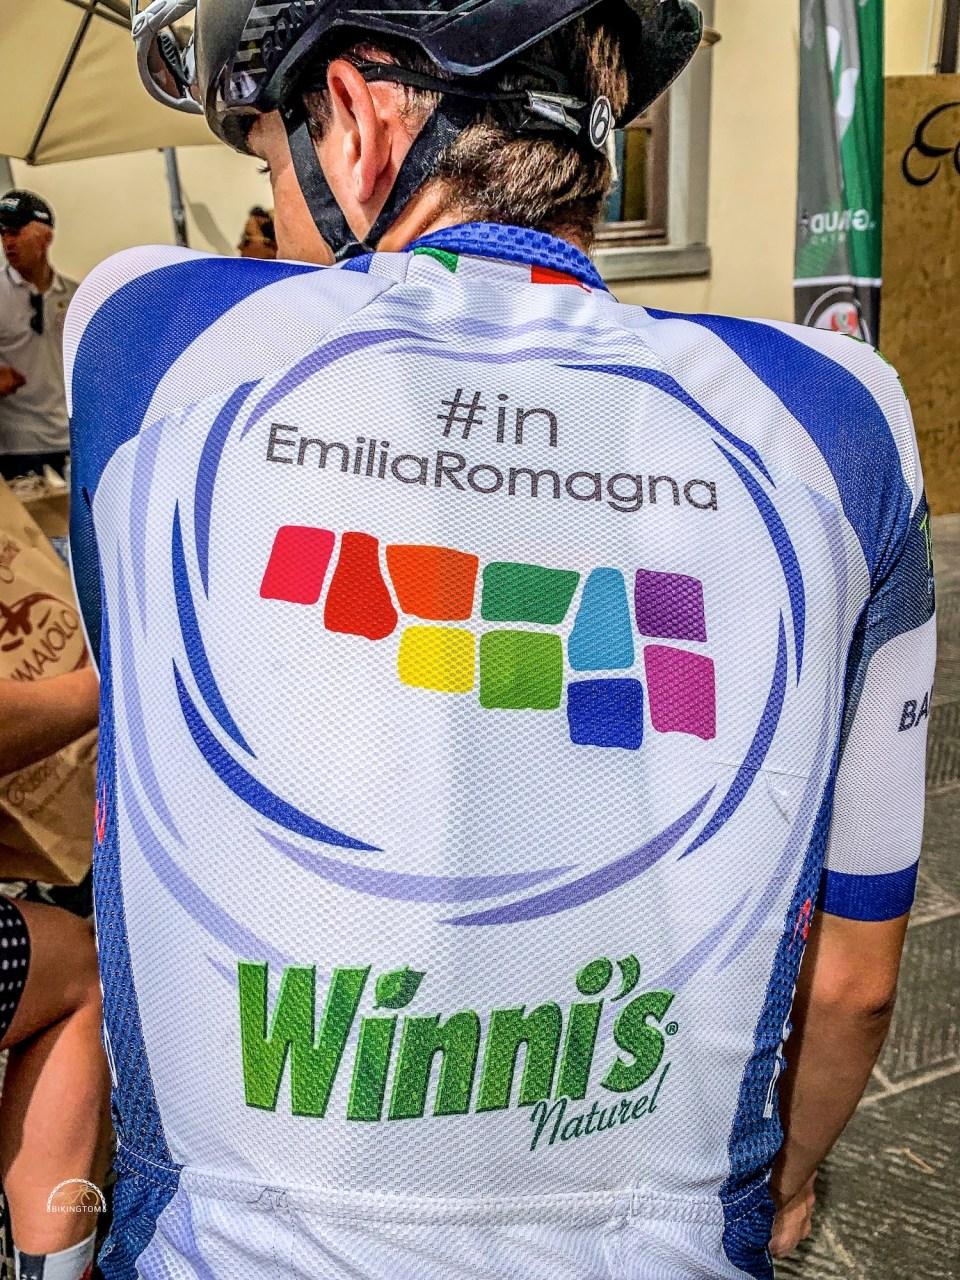 Emilia Romagna,Cycling,Fahrrad,Italien,bikingtom,Terrabici